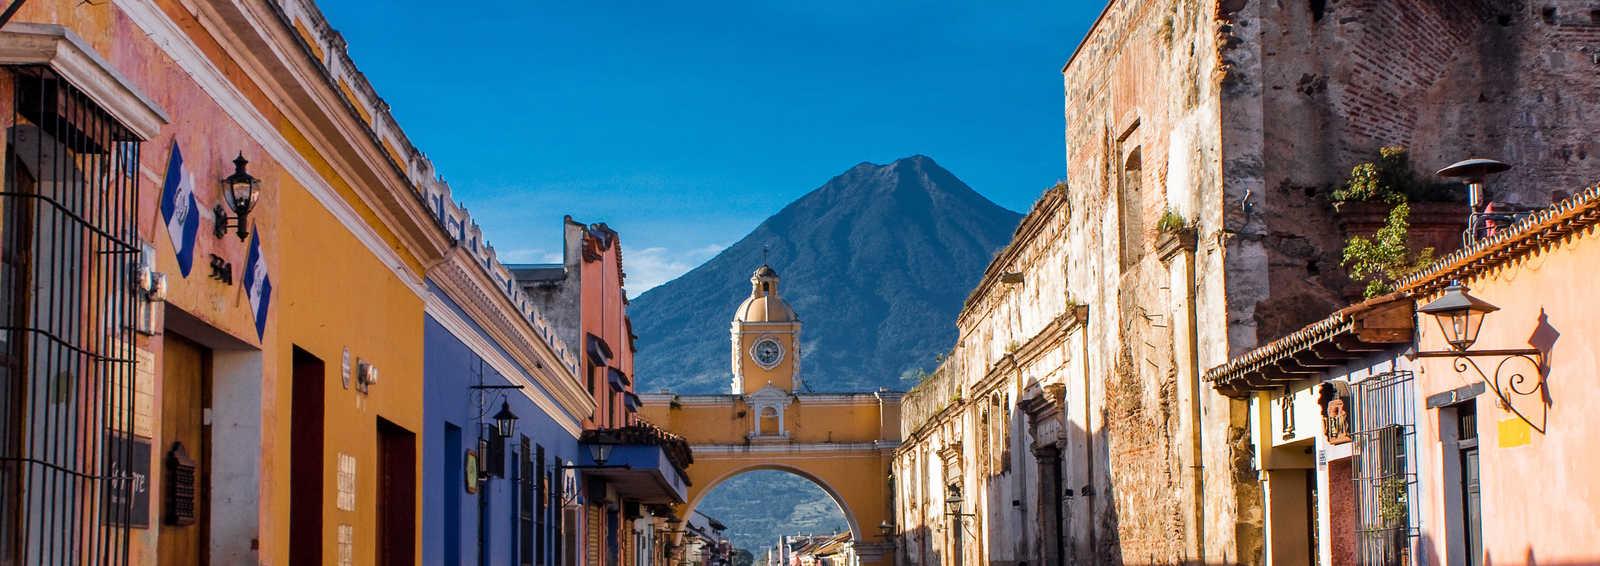 St Catarina arch and volcano Antigua, Guatemala